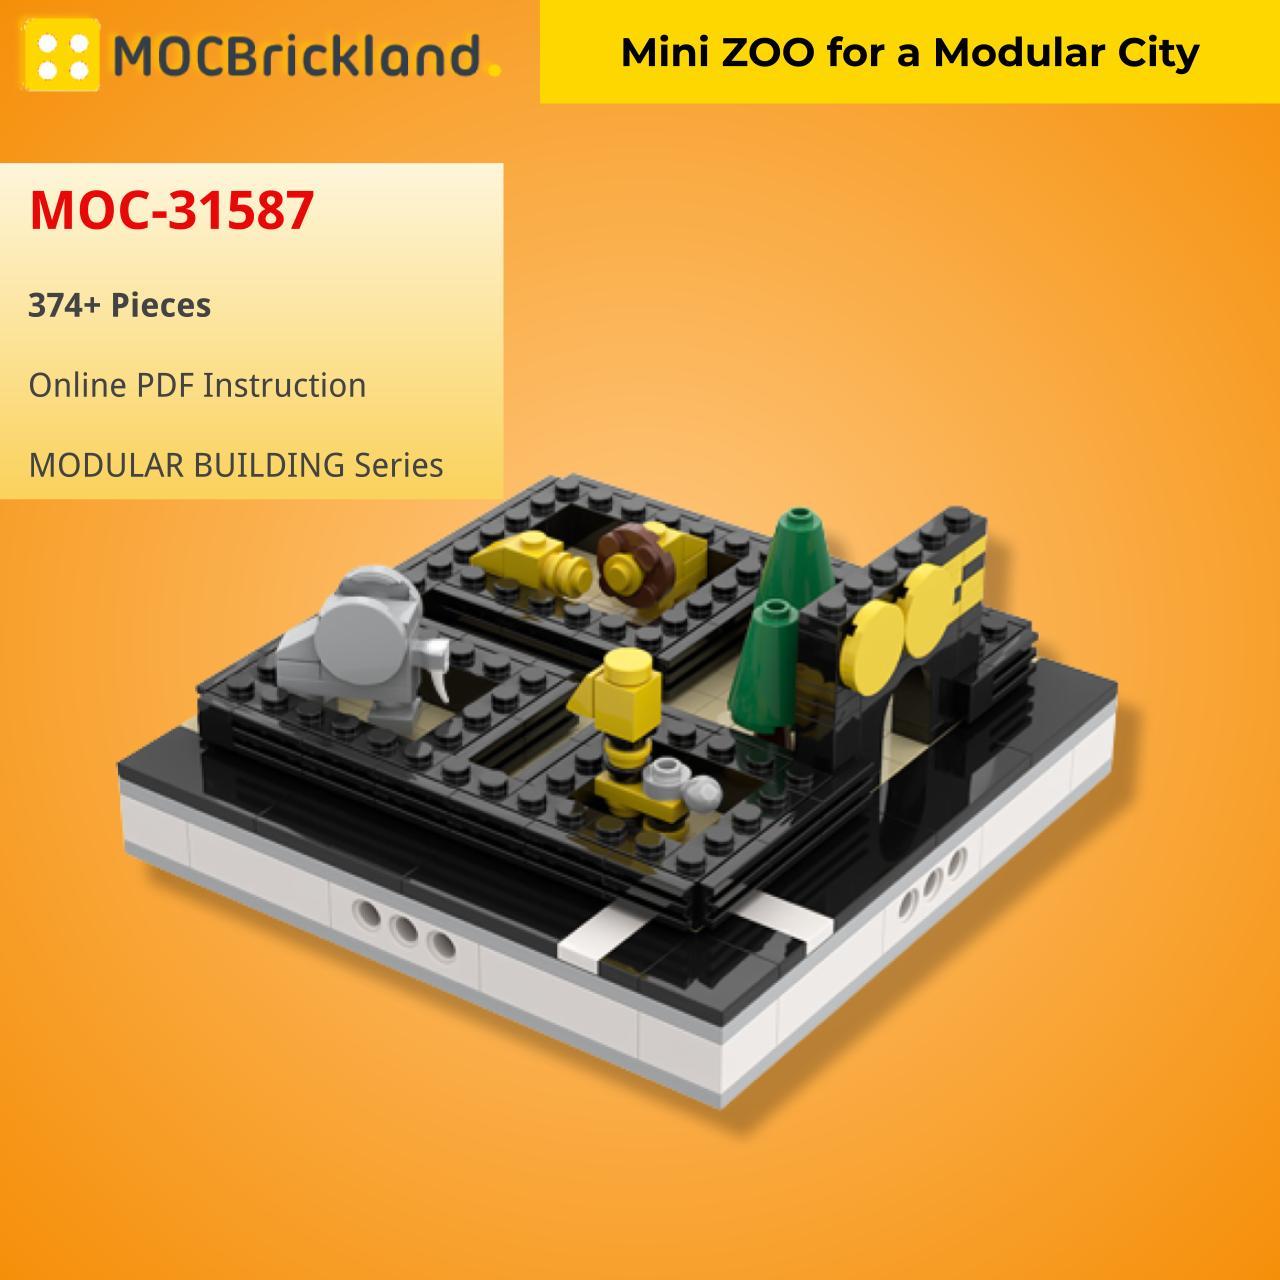 Mini ZOO for a Modular City MODULAR BUILDING MOC-31587 WITH 374 PIECES